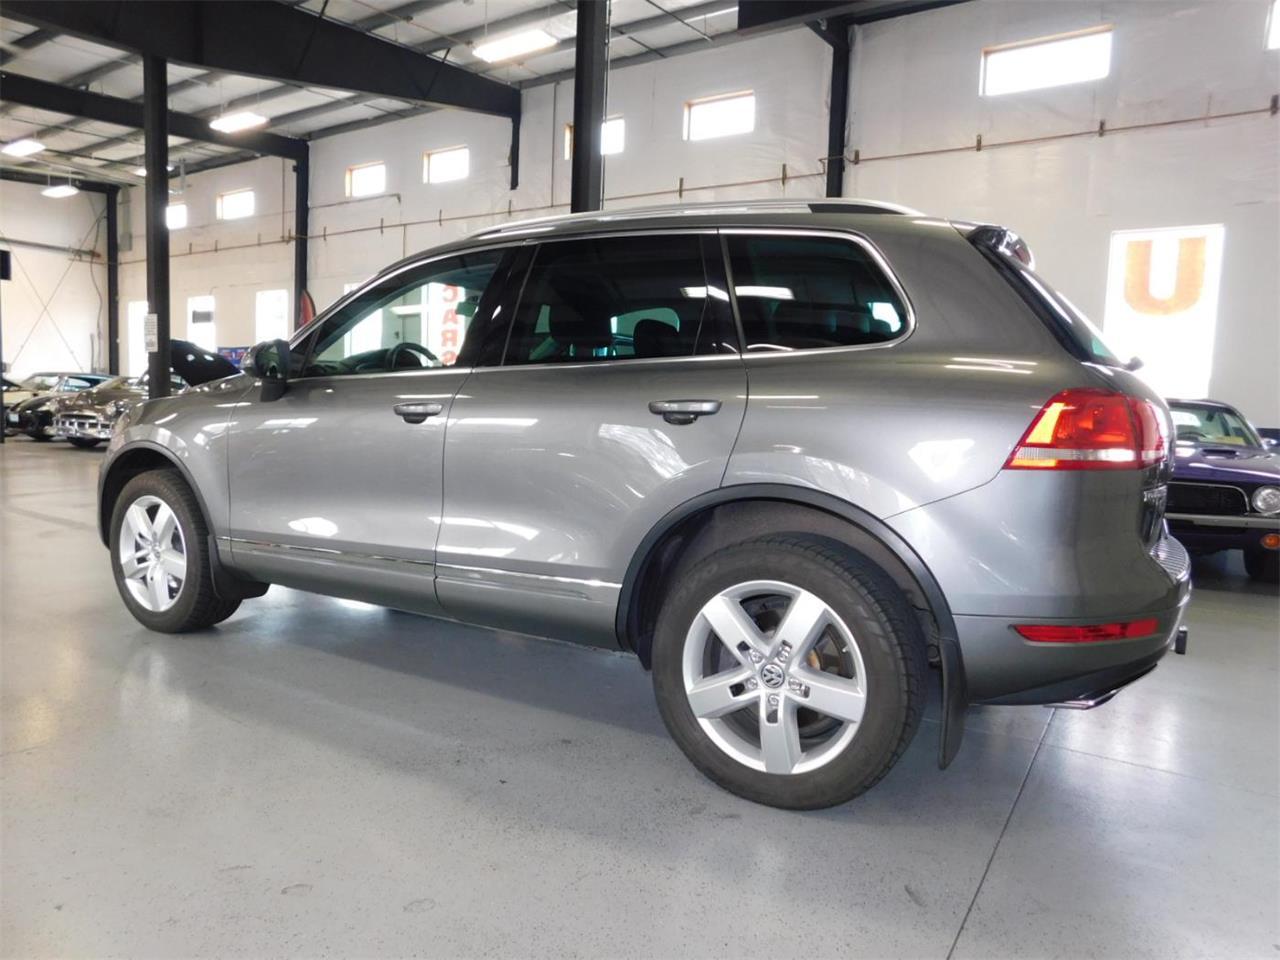 2013 Volkswagen Touareg For Sale Classiccars Com Cc